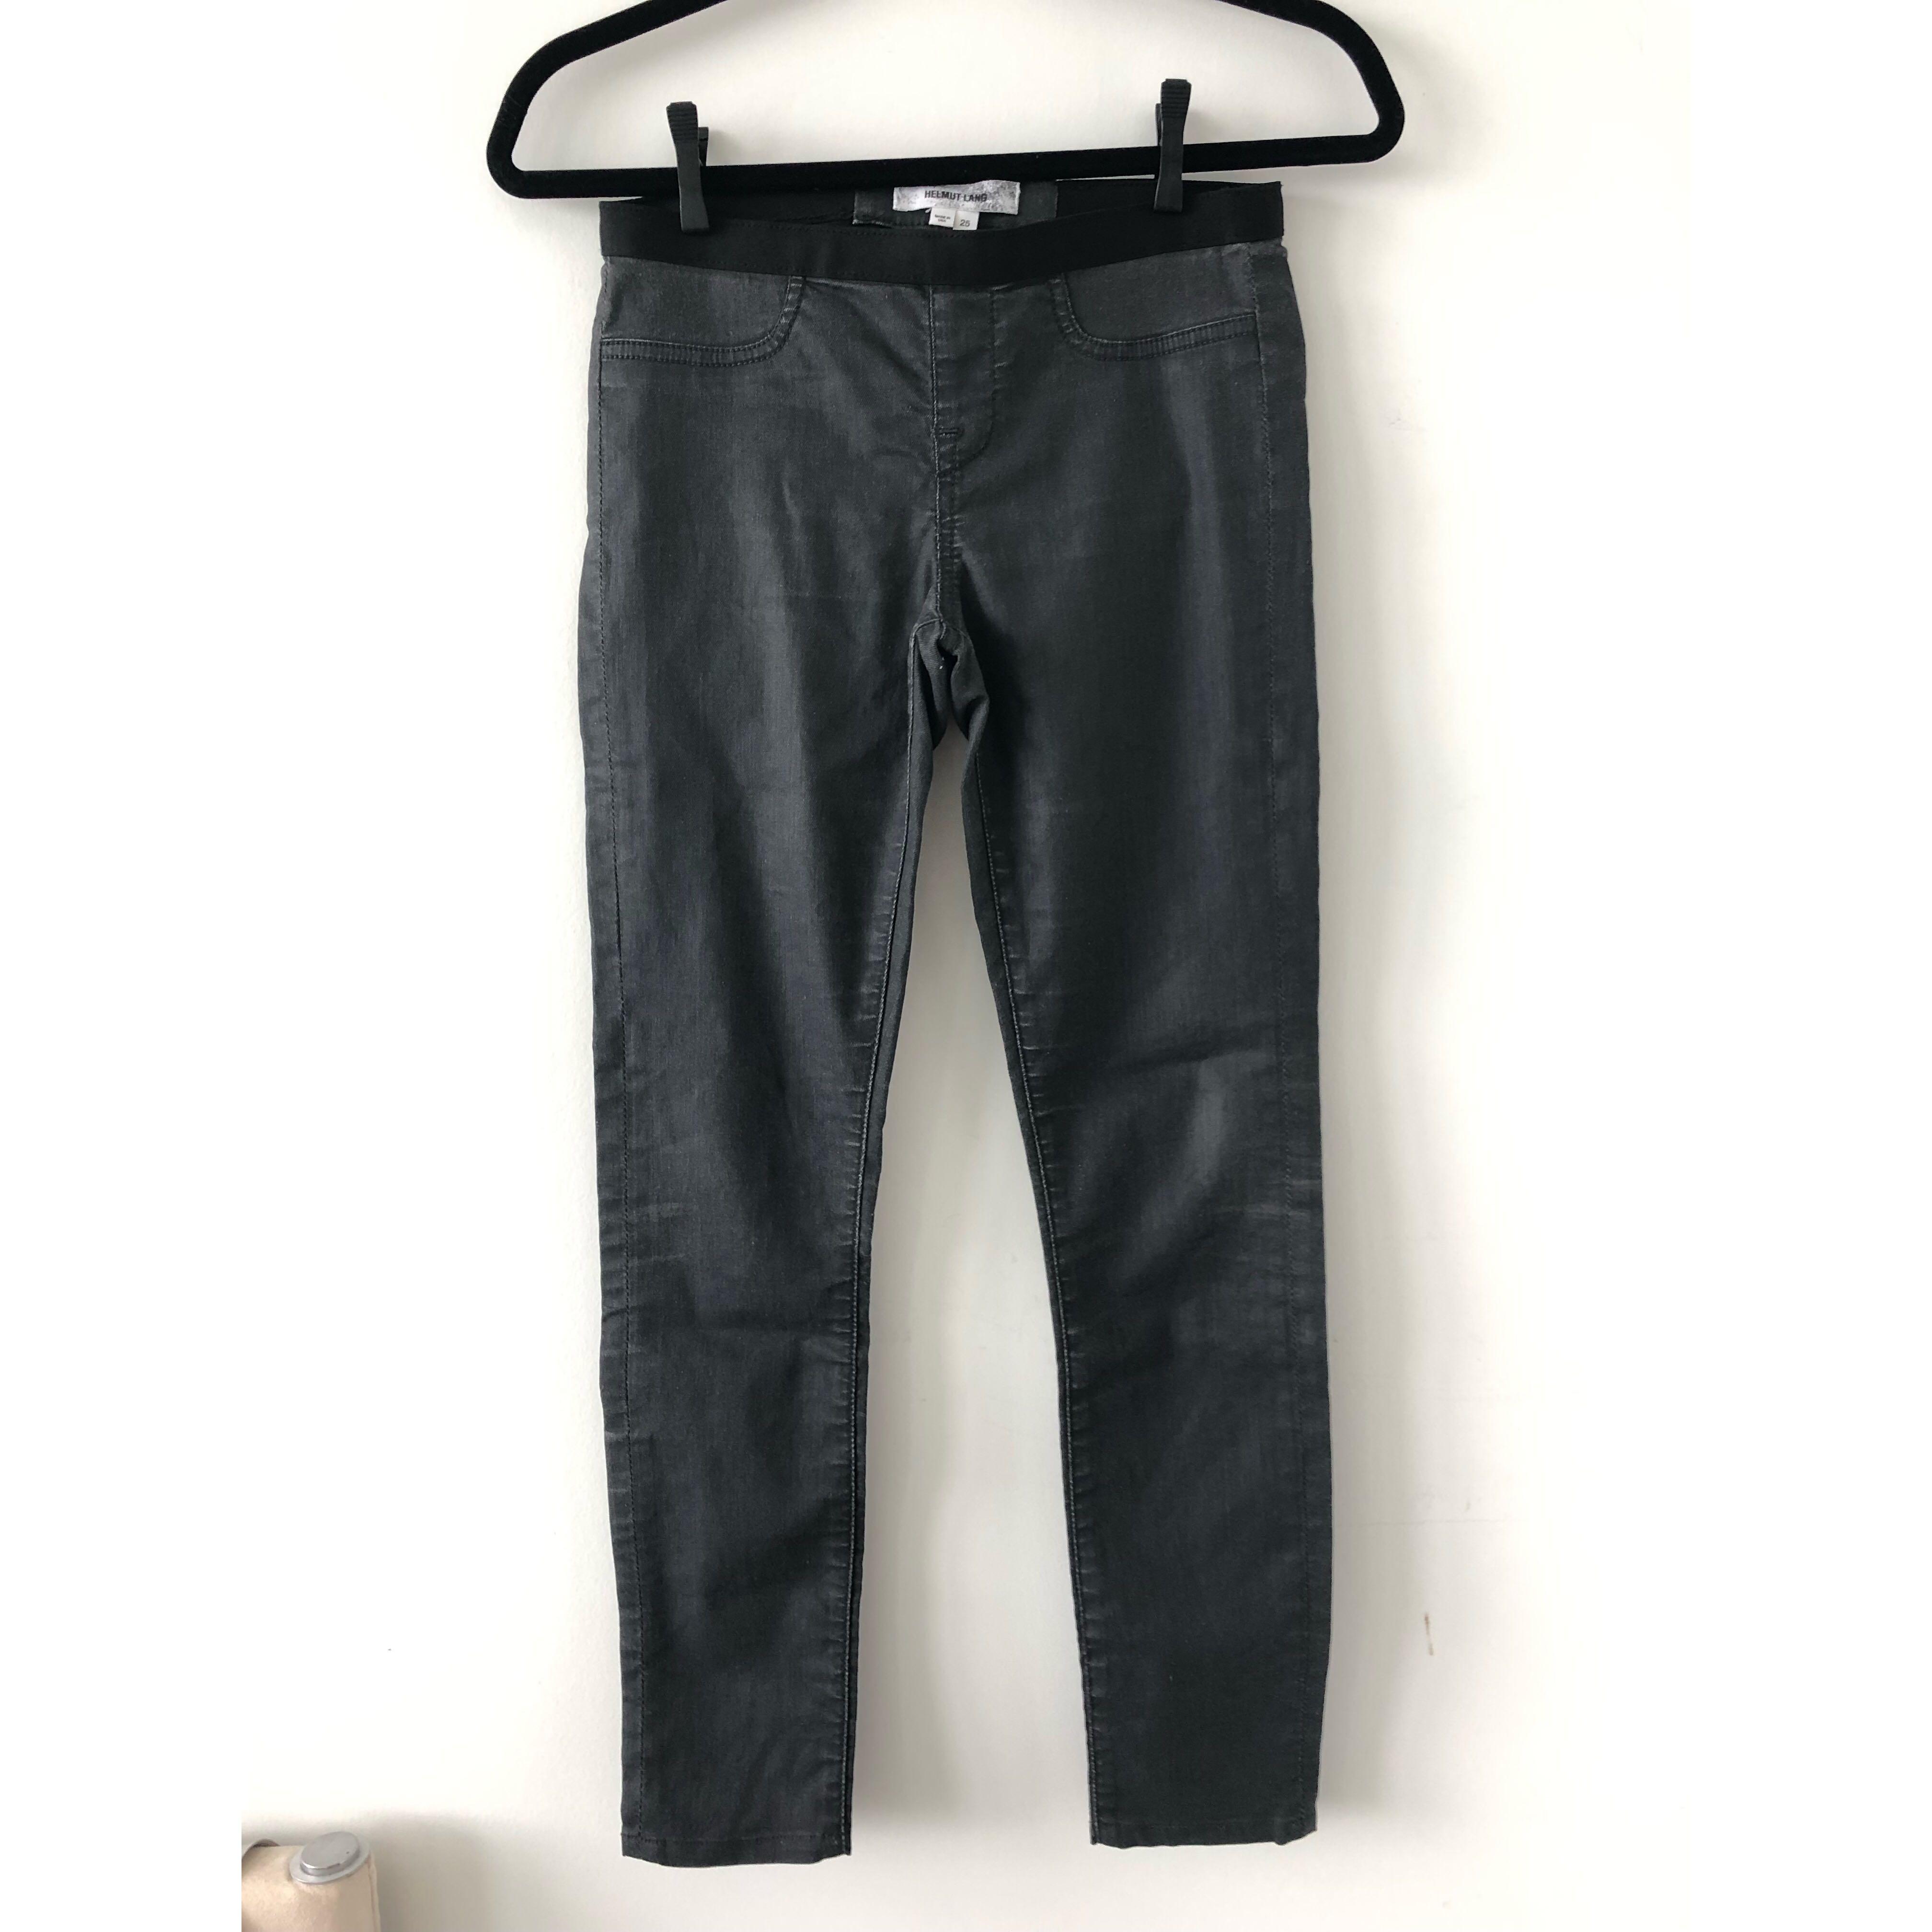 Helmut Lang Black Moto Jeans